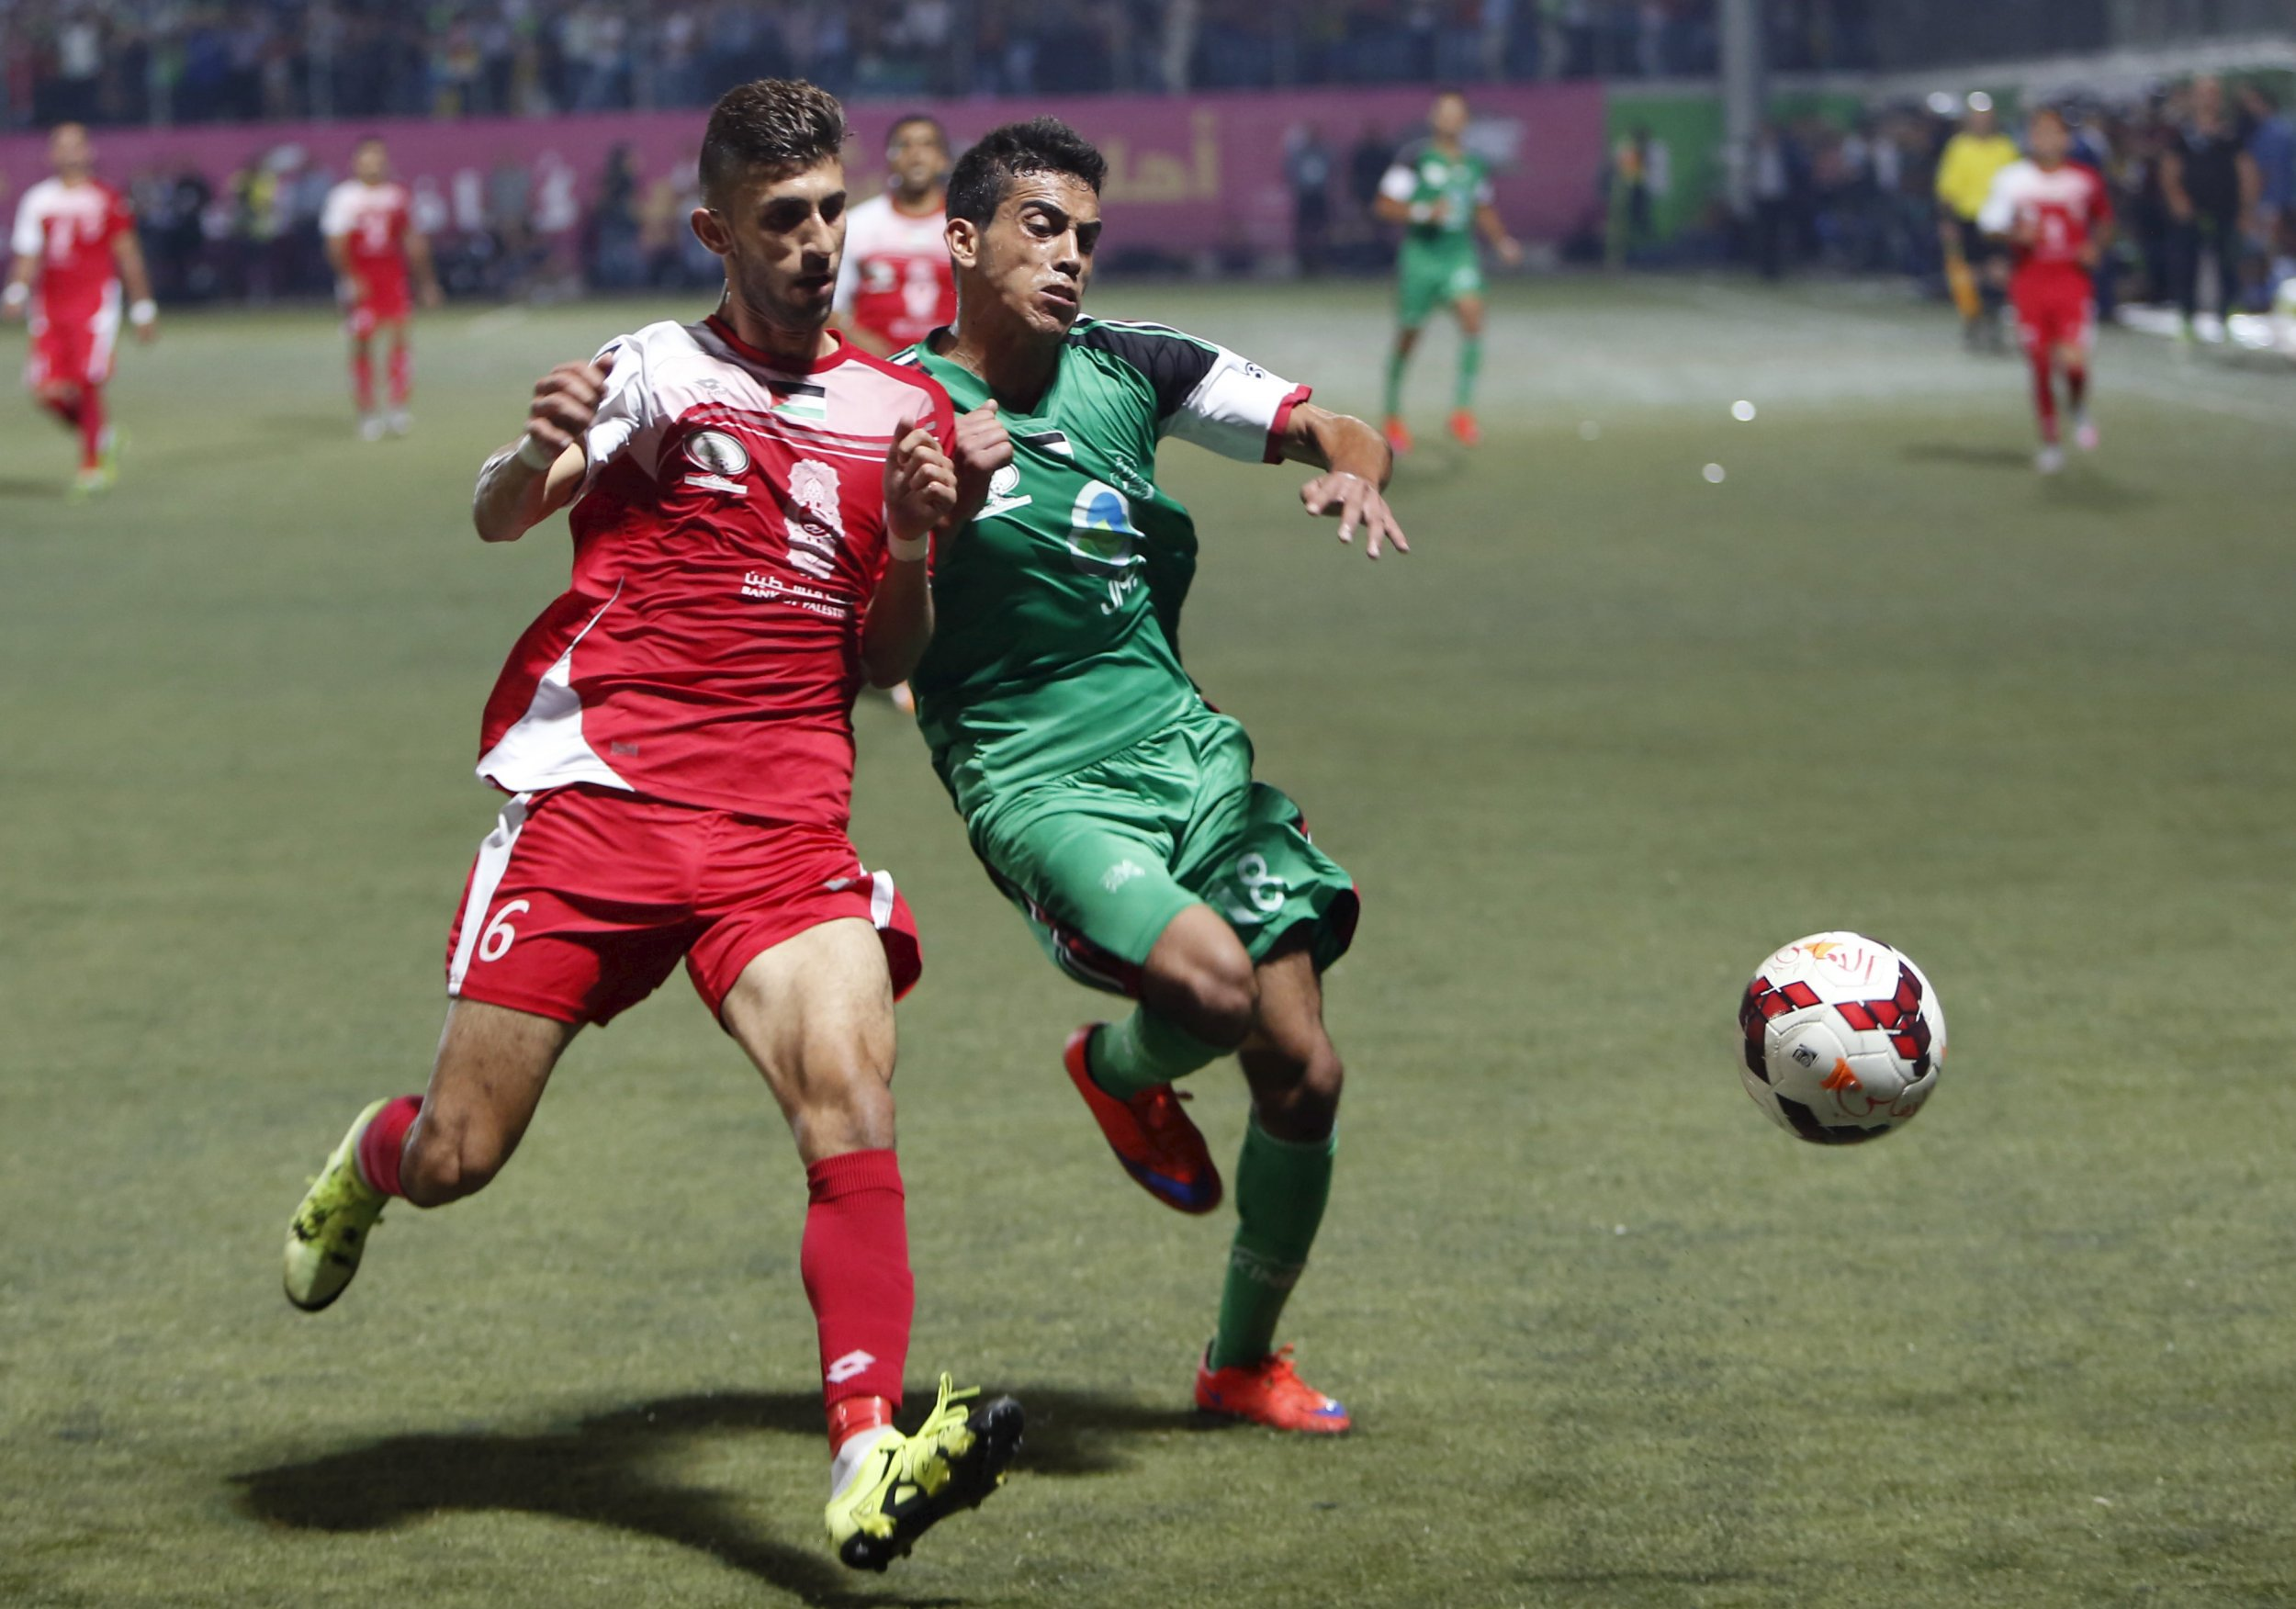 Gaza West Bank Football Match